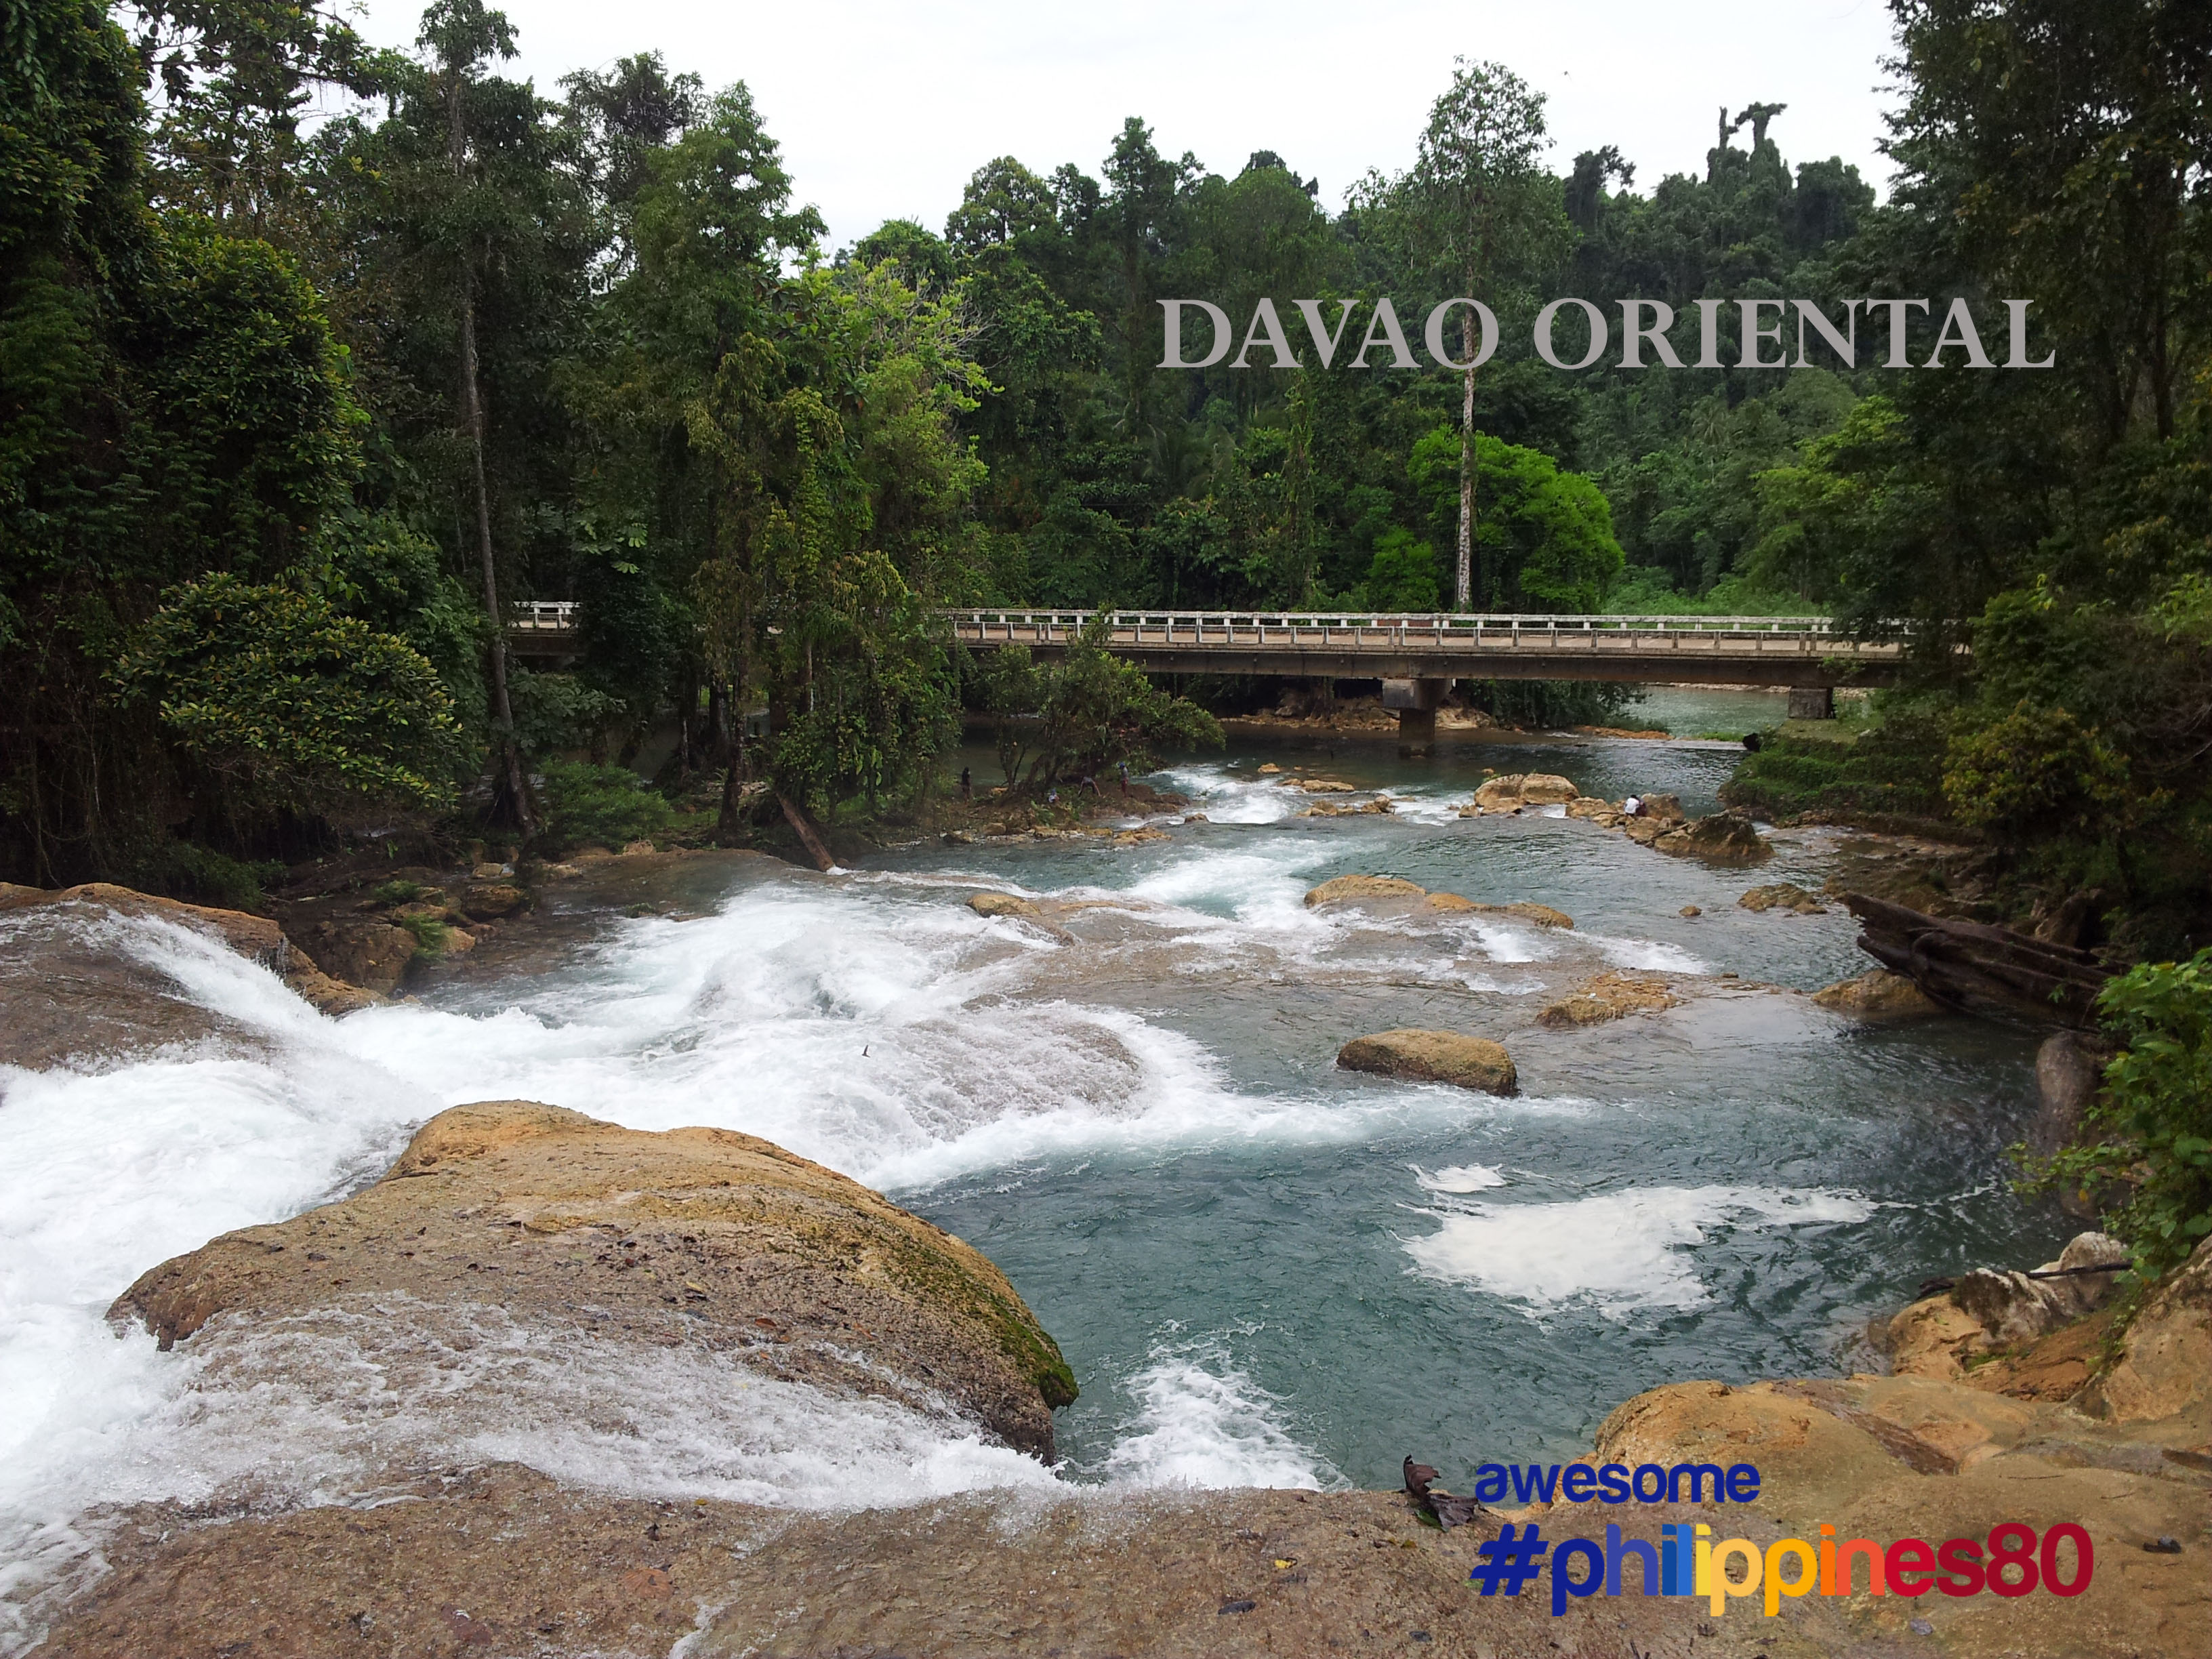 The 10 Best Romantic Restaurants in Davao City - TripAdvisor